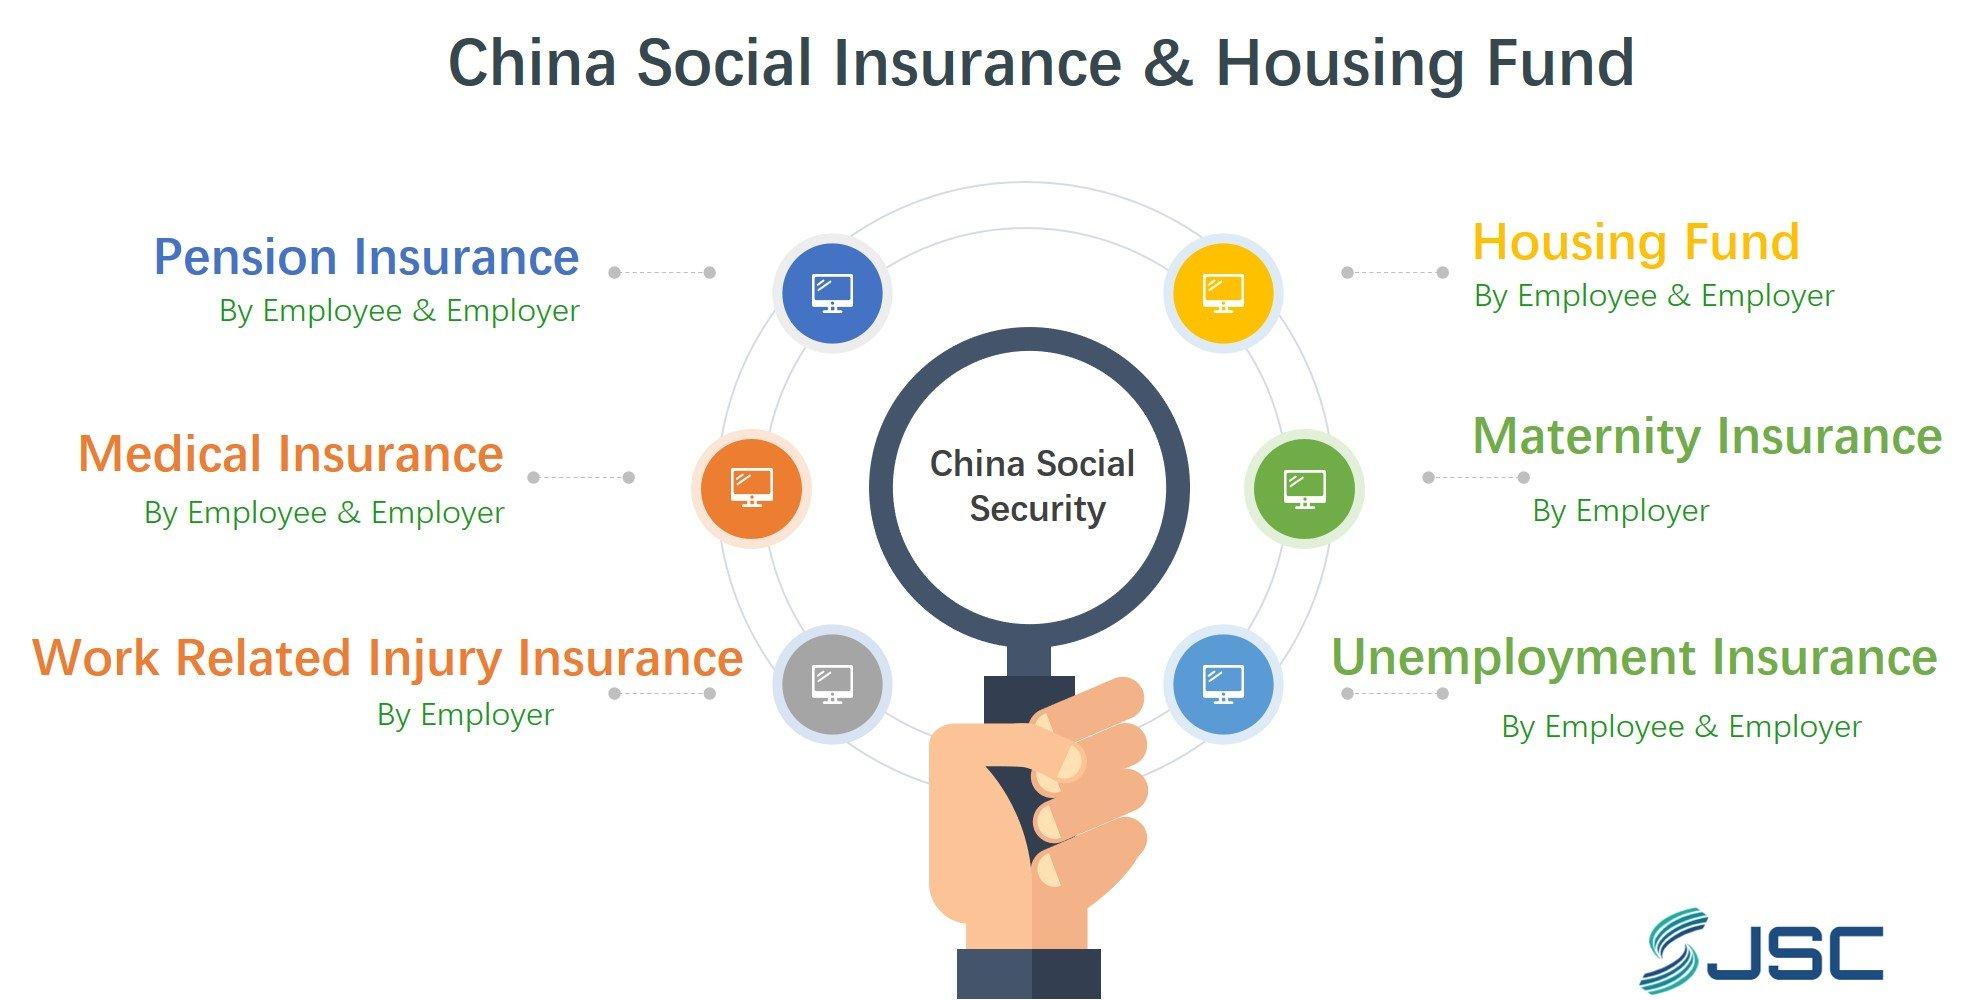 China Social Insurance & Housing Fund